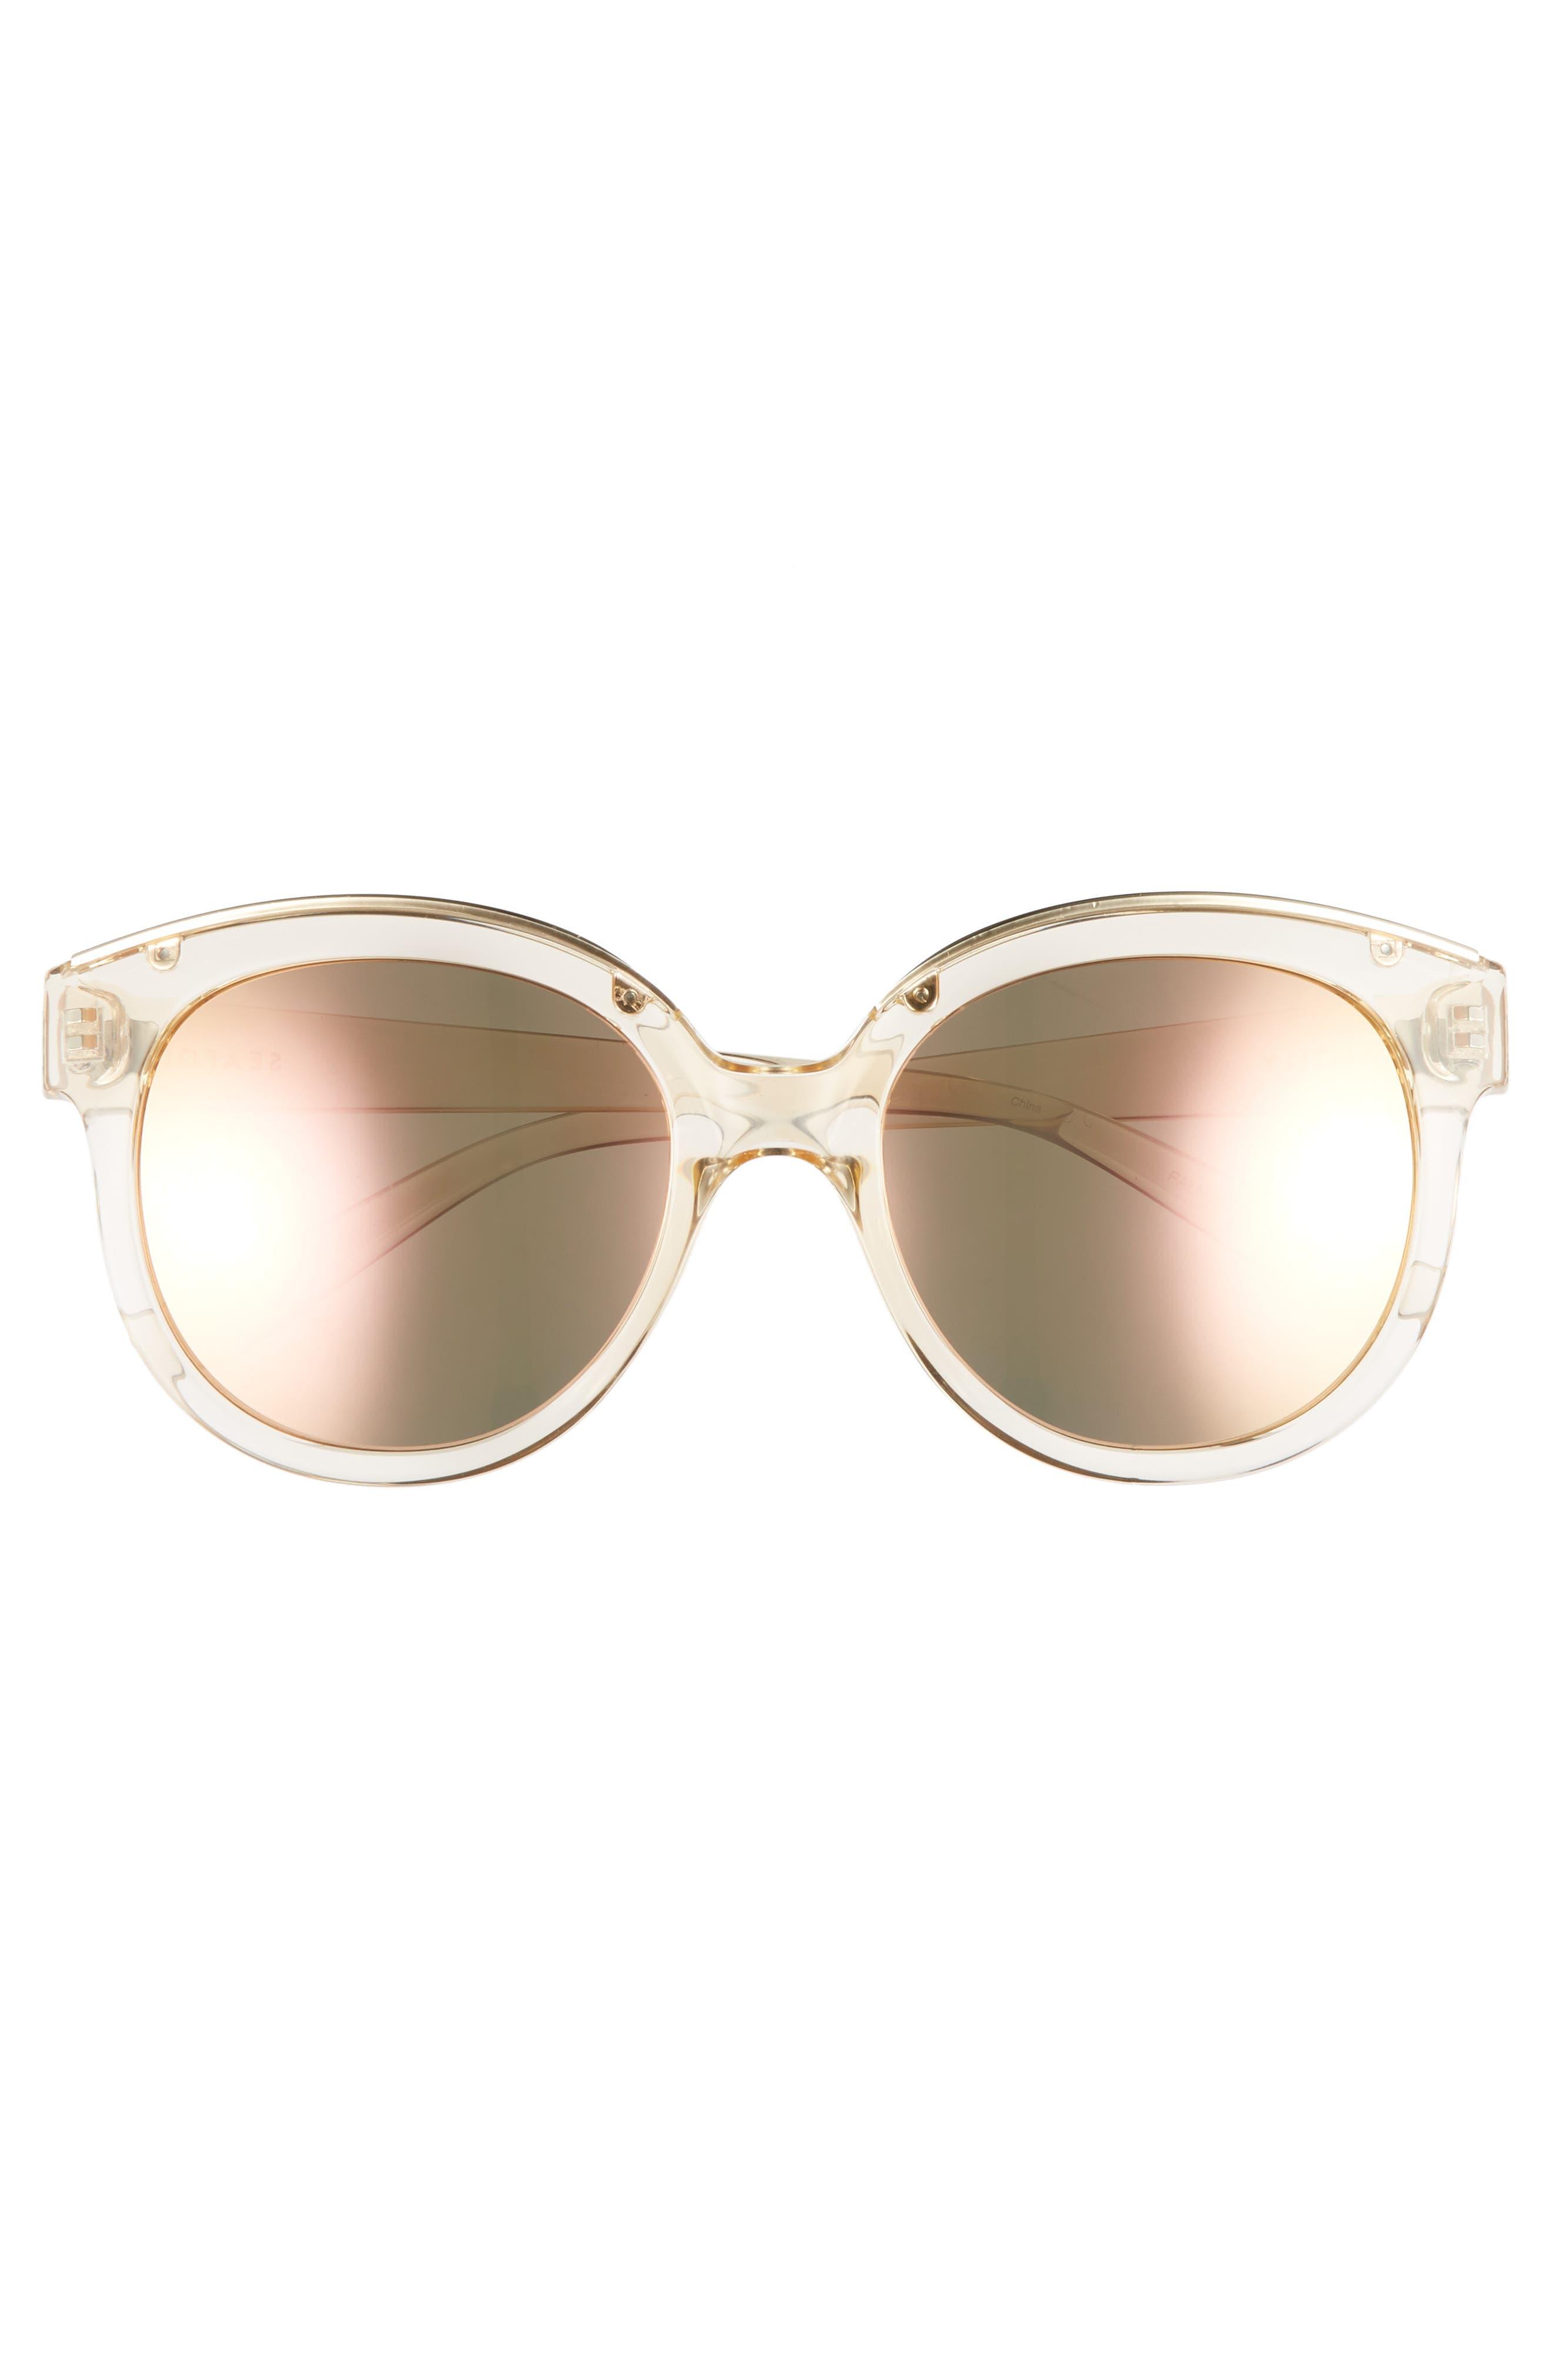 Palm Beach 54mm Cat Eye Sunglasses,                             Alternate thumbnail 3, color,                             Sand